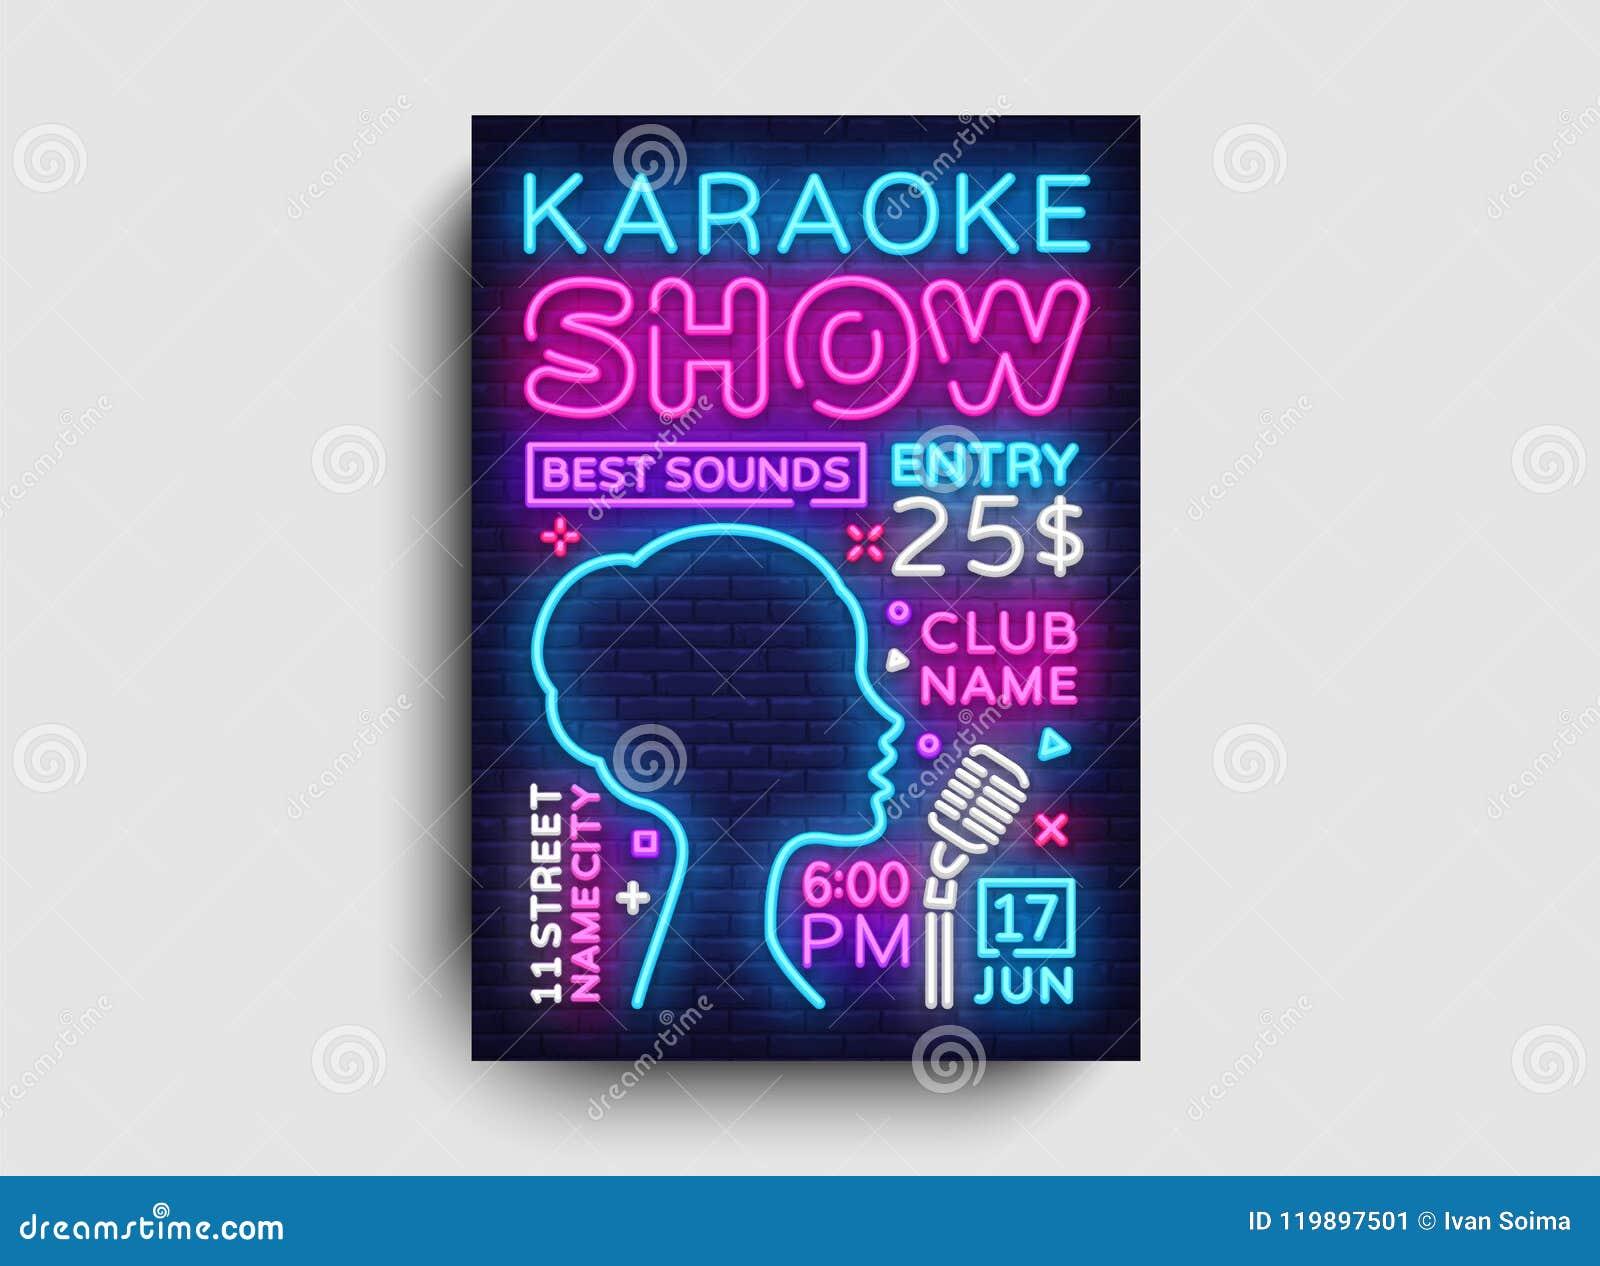 Karaoke Design Poster Vector Karaoke Party Design Template Flyer